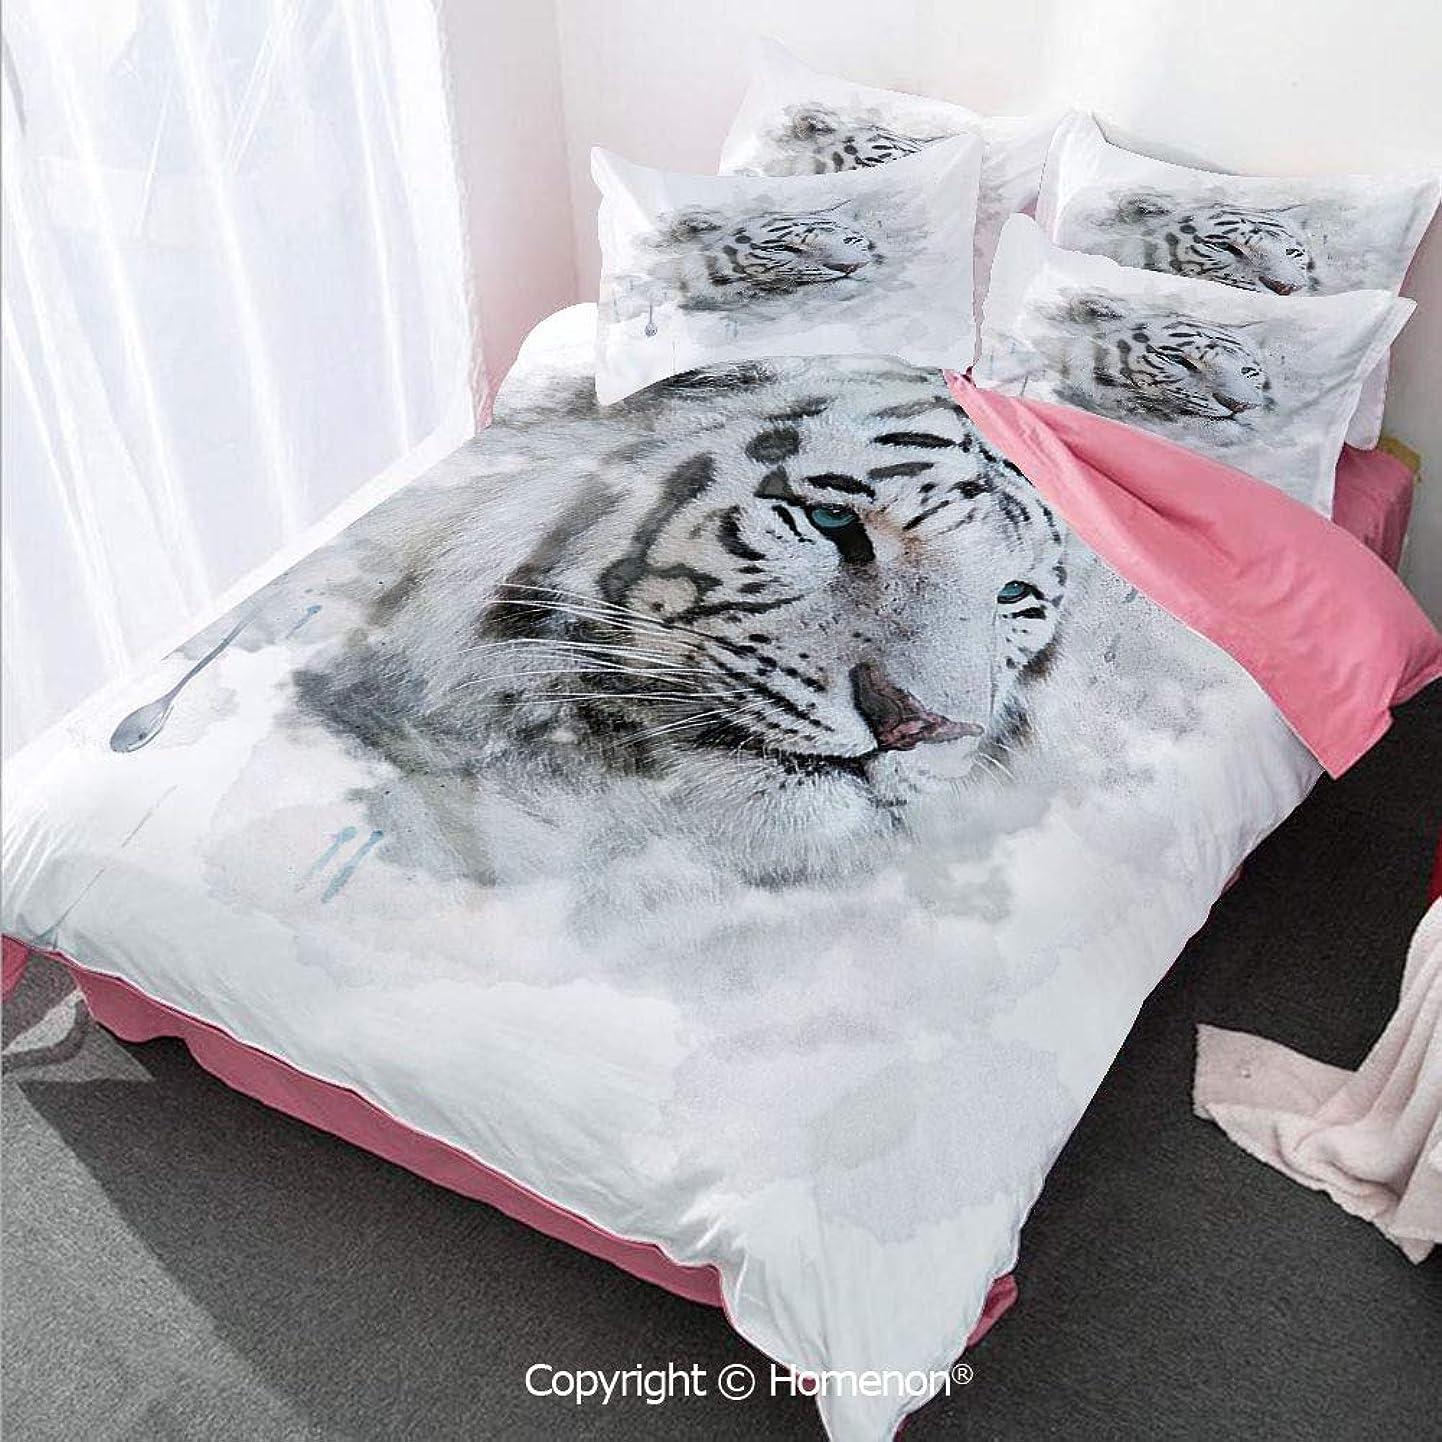 Homenon Animal Girl's Room Cover Set Full Size,Artistic Portrait of a White Tiger Wild Nature Predator Wate,Decorative 3 Piece Bedding Set with 2 Pillow Shams Black Grey White mcoxlpmftka1